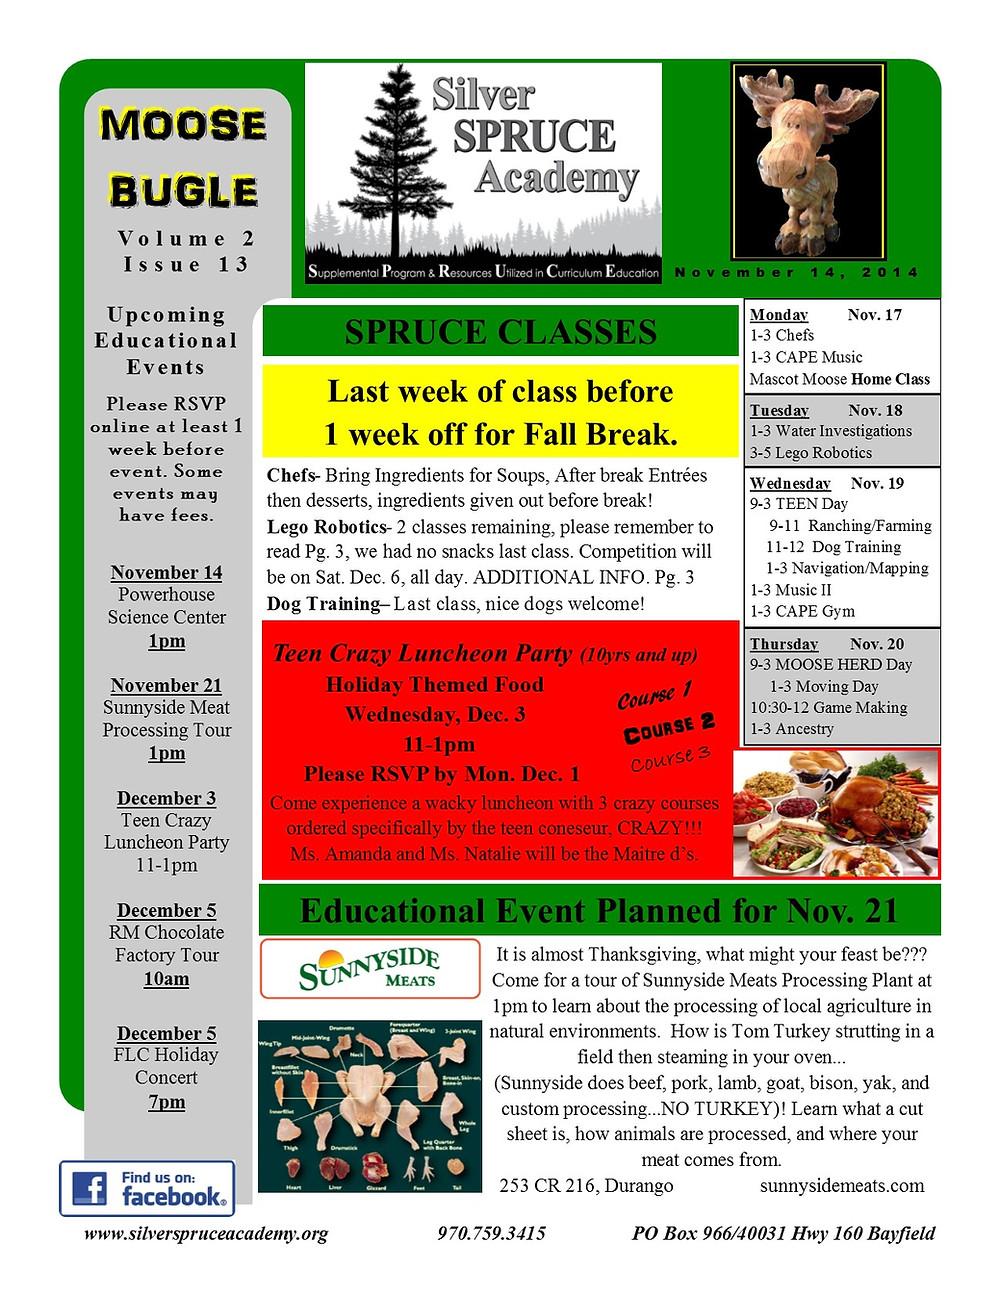 Moose Bugle 11-14-14 Page 1.jpg